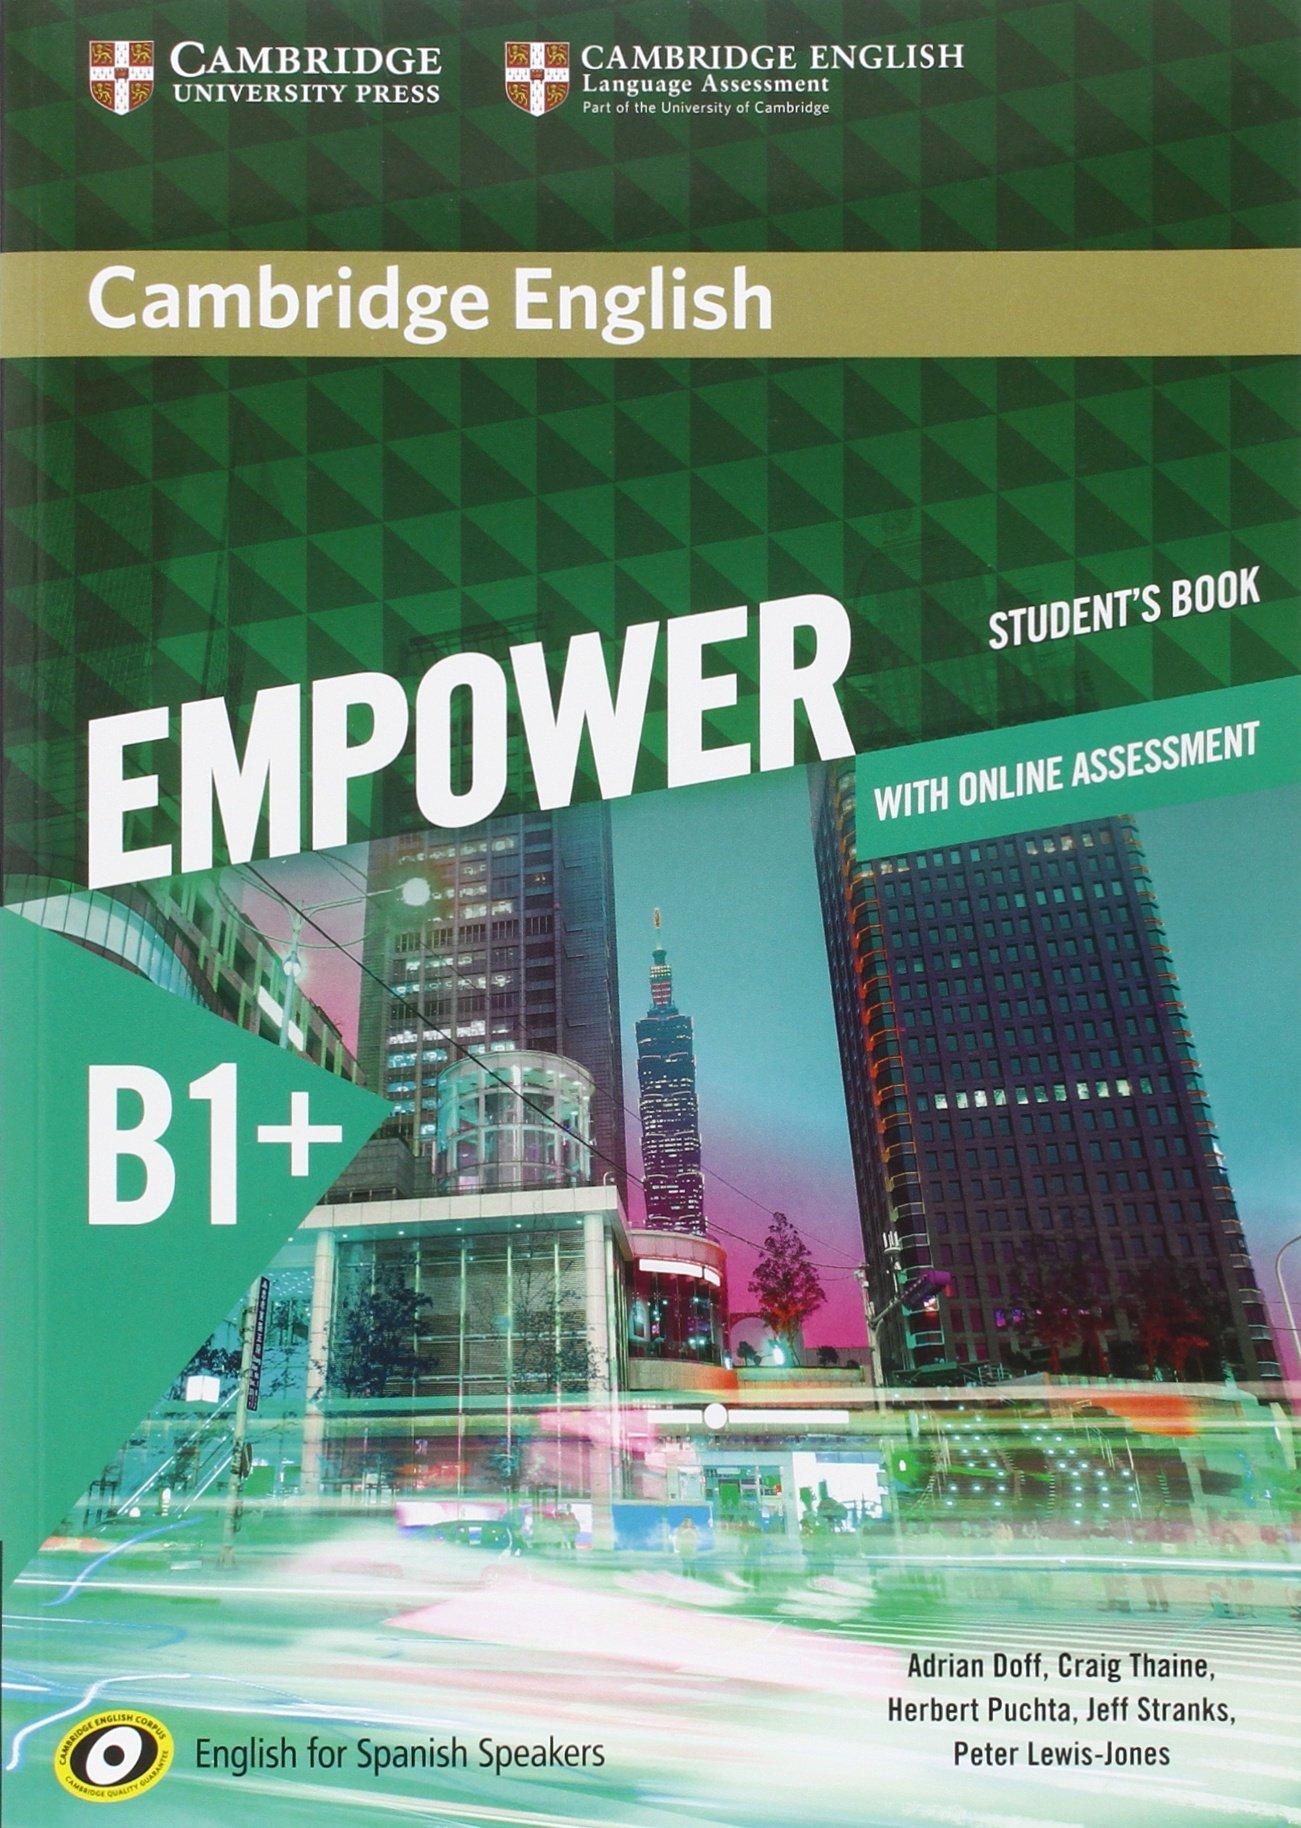 Cambridge English Empower for Spanish Speakers B1+ Student's Book with Online Assessment and Practice (Inglés) Tapa blanda – 10 jun 2016 Adrian Doff Craig Thaine Herbert Puchta Jeff Stranks